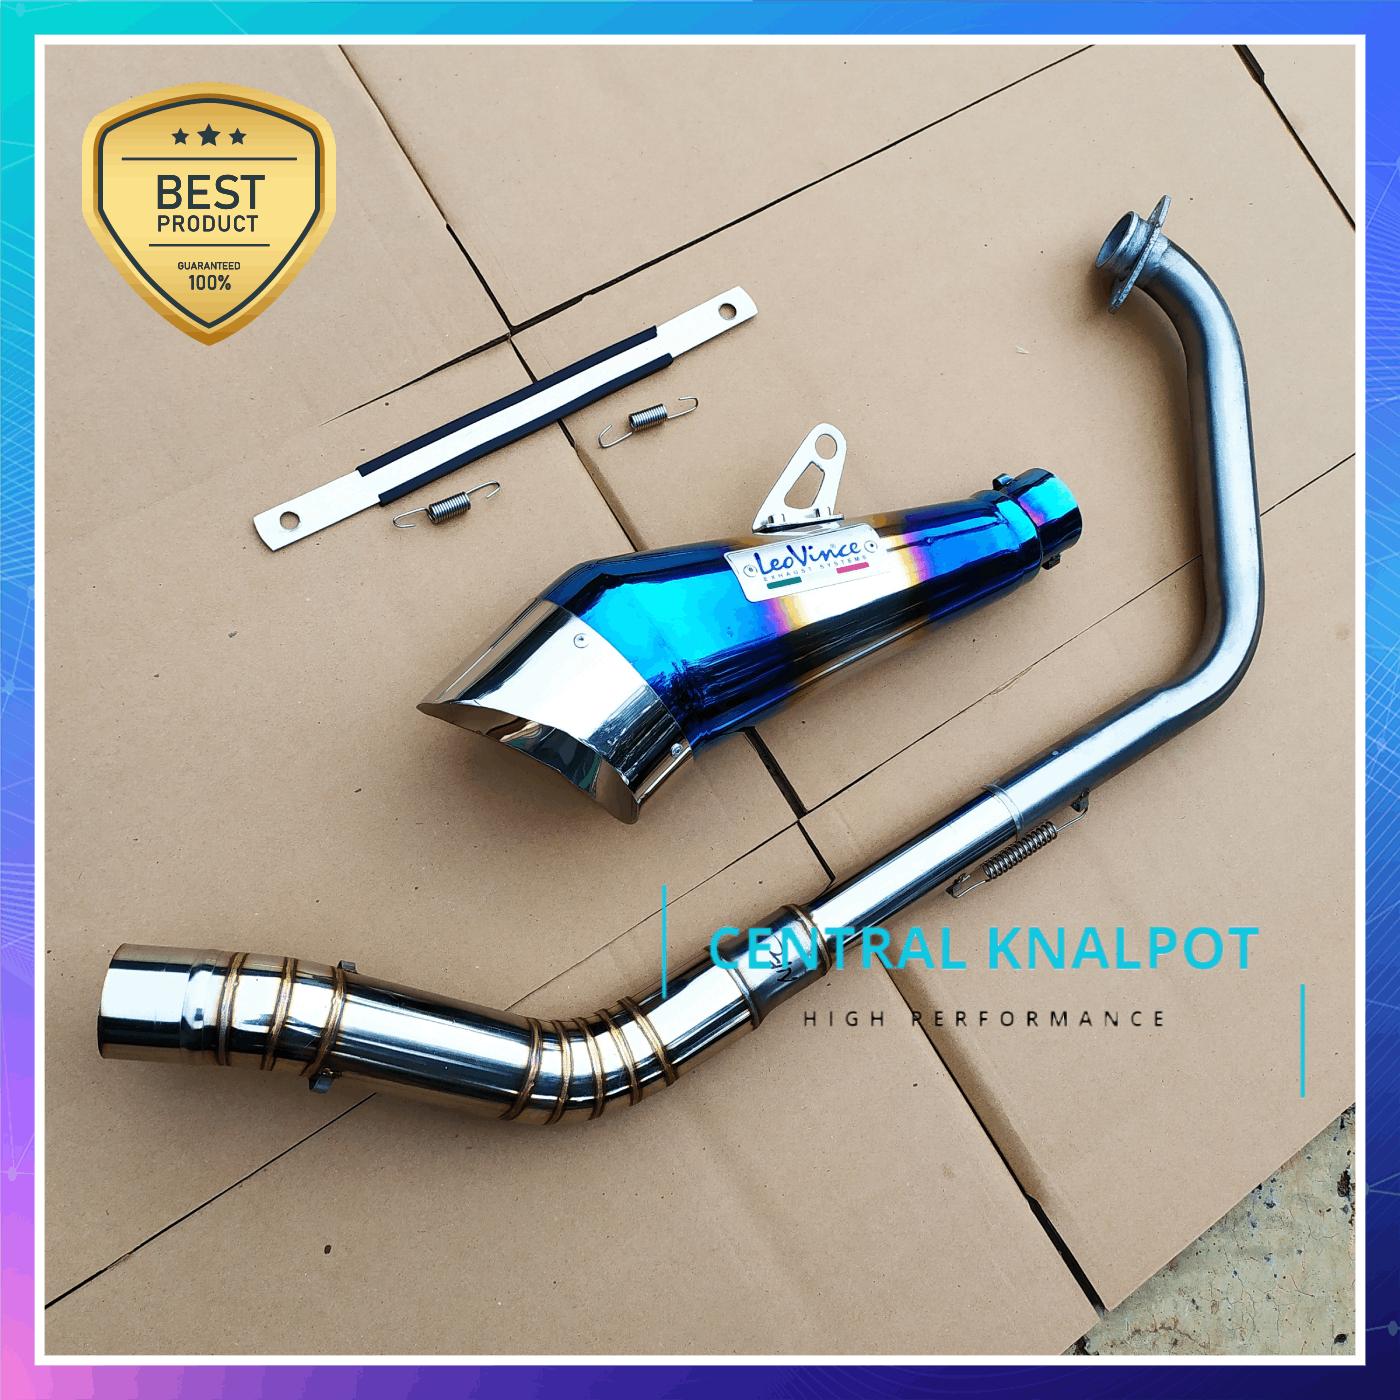 terlaris knalpot racing vixion/leovince/knalpot sonic/vixion/cbr 150r/cb150r/r15 v3/r15 v2/gsxr150/leovince cobra half blue